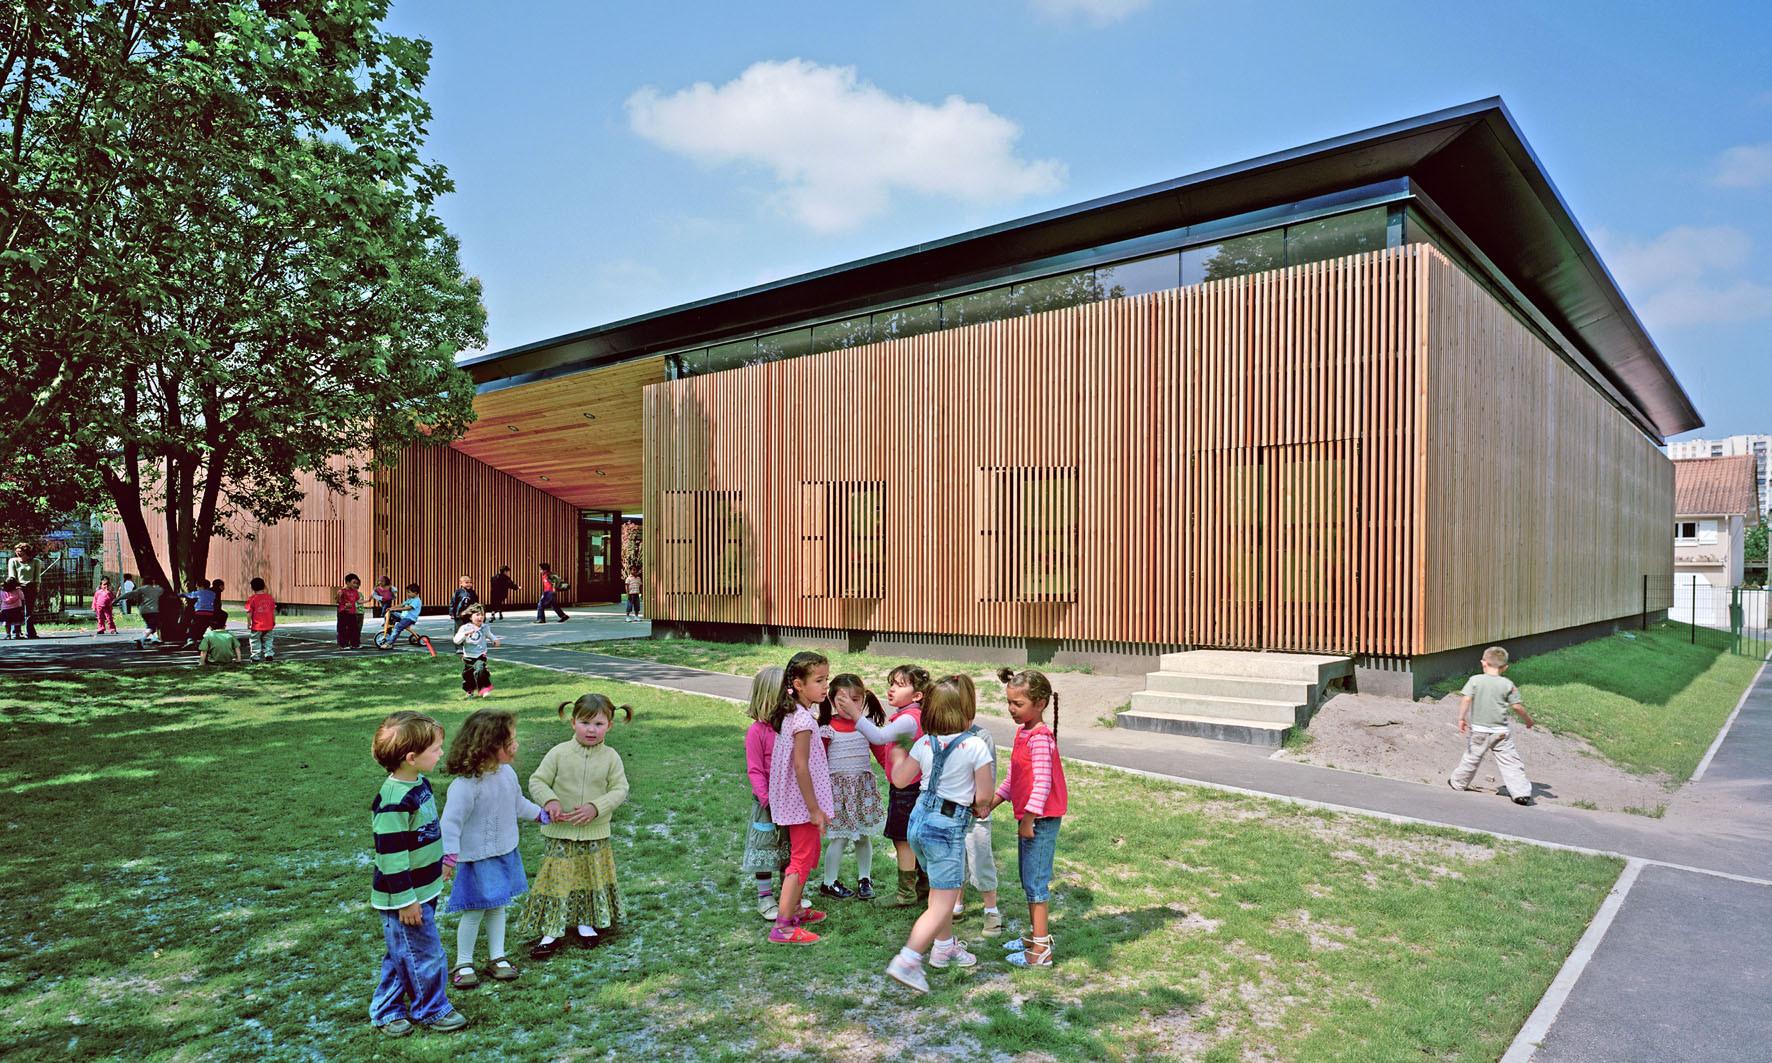 l'Ecole Jean Jaures / Marjan Hessamfar & Joe Vérons + Art'ur architectes, Courtesy of Marjan Hessamfar & Joe Vérons